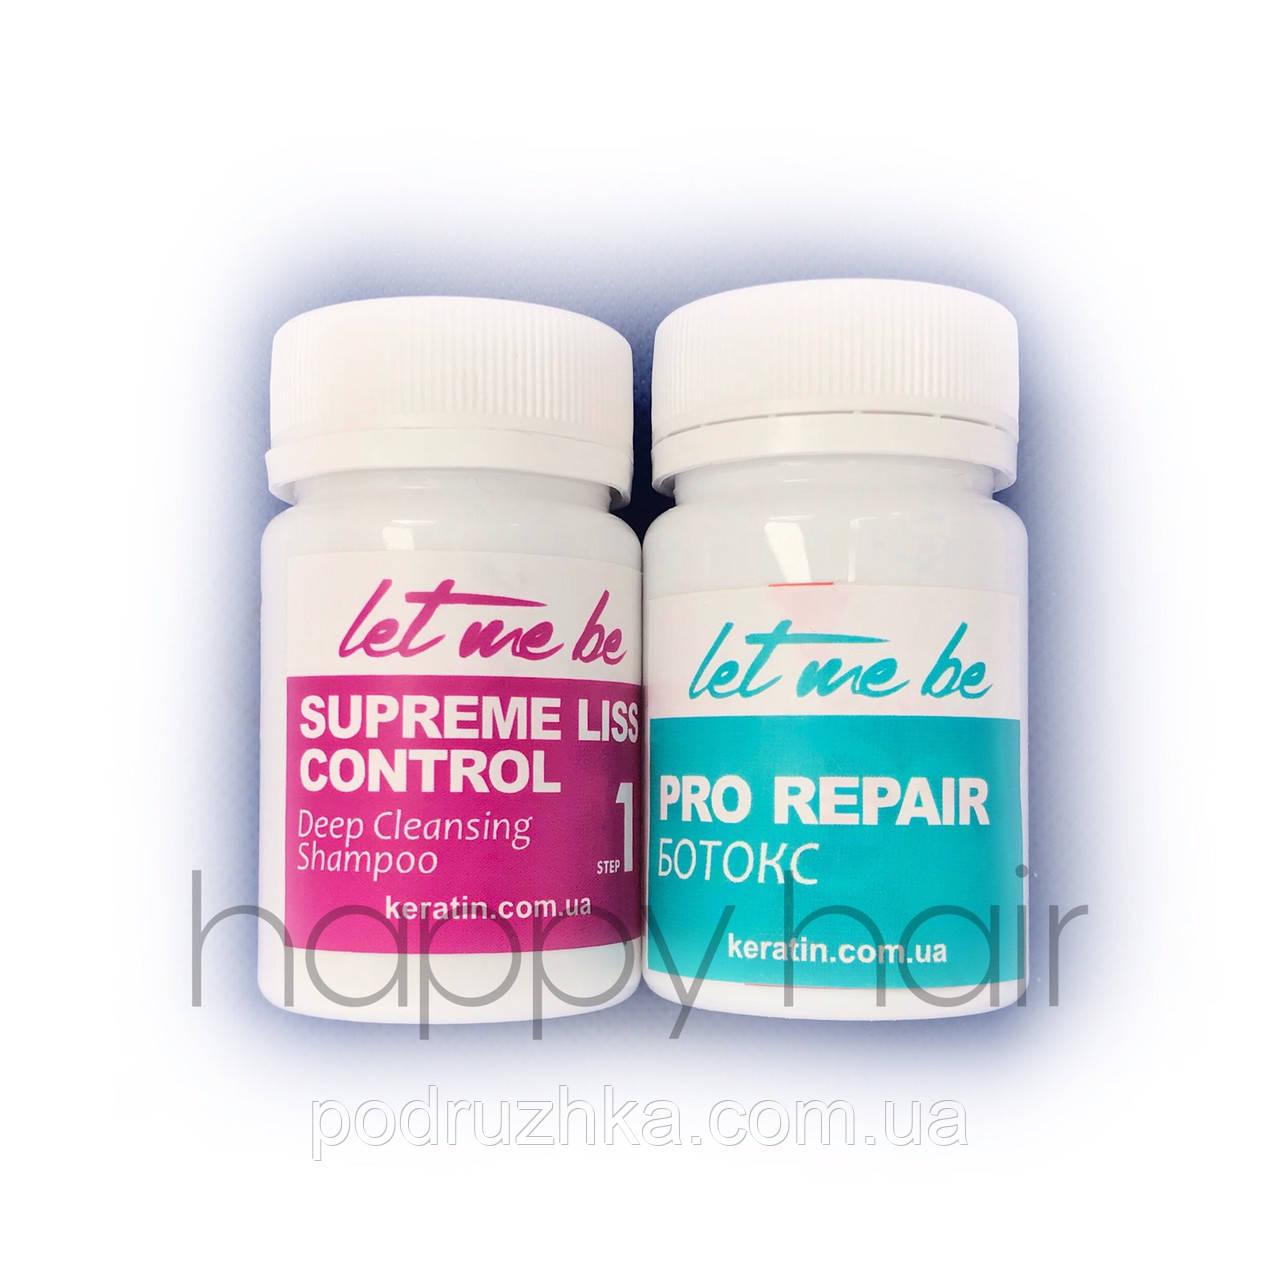 Let me be B-Btox Pro Repair Набор холодный ботекс для волос 30/50 мл (разлив)